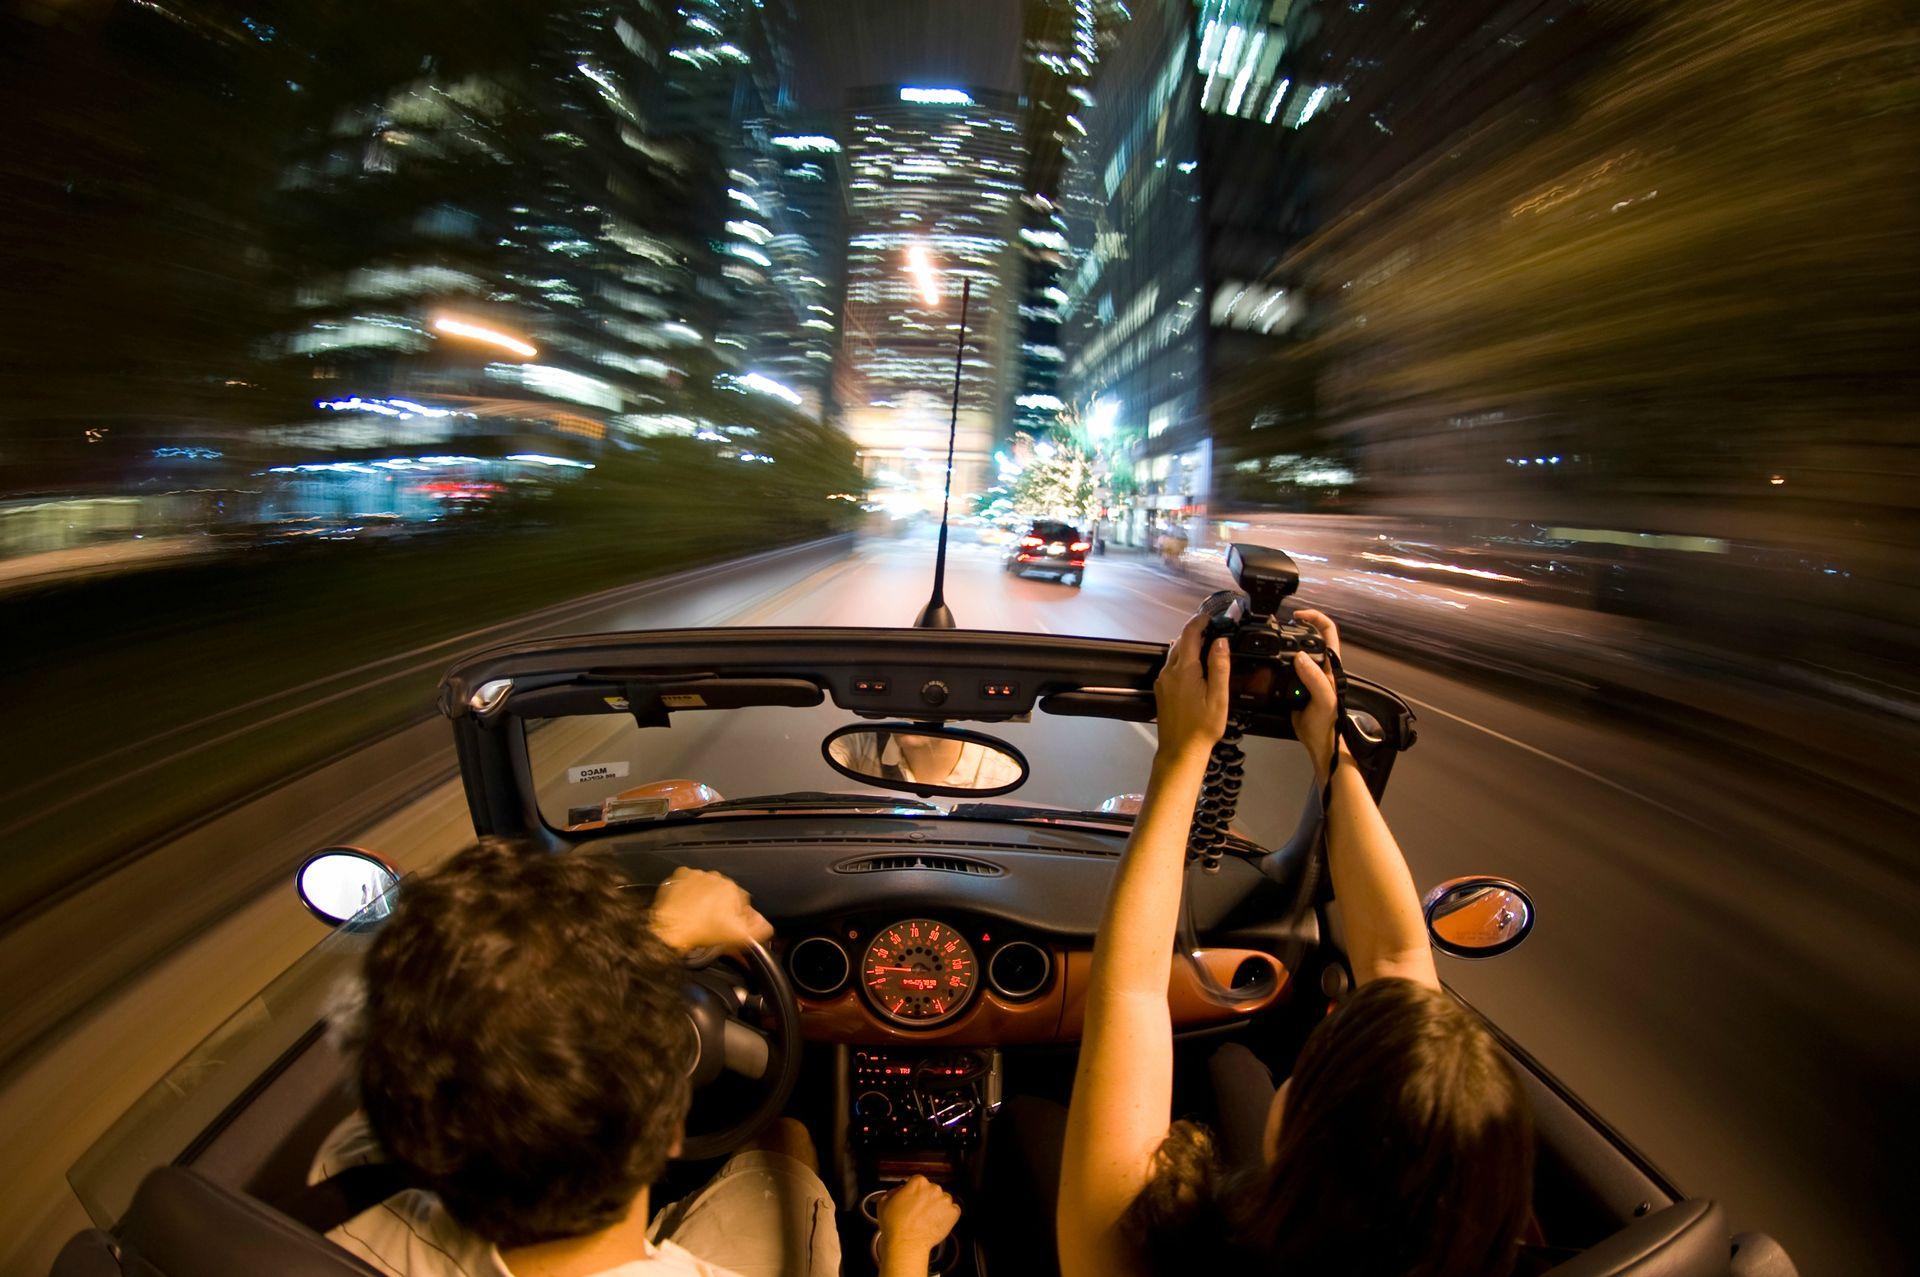 driving car night town city fast shutter speed blur